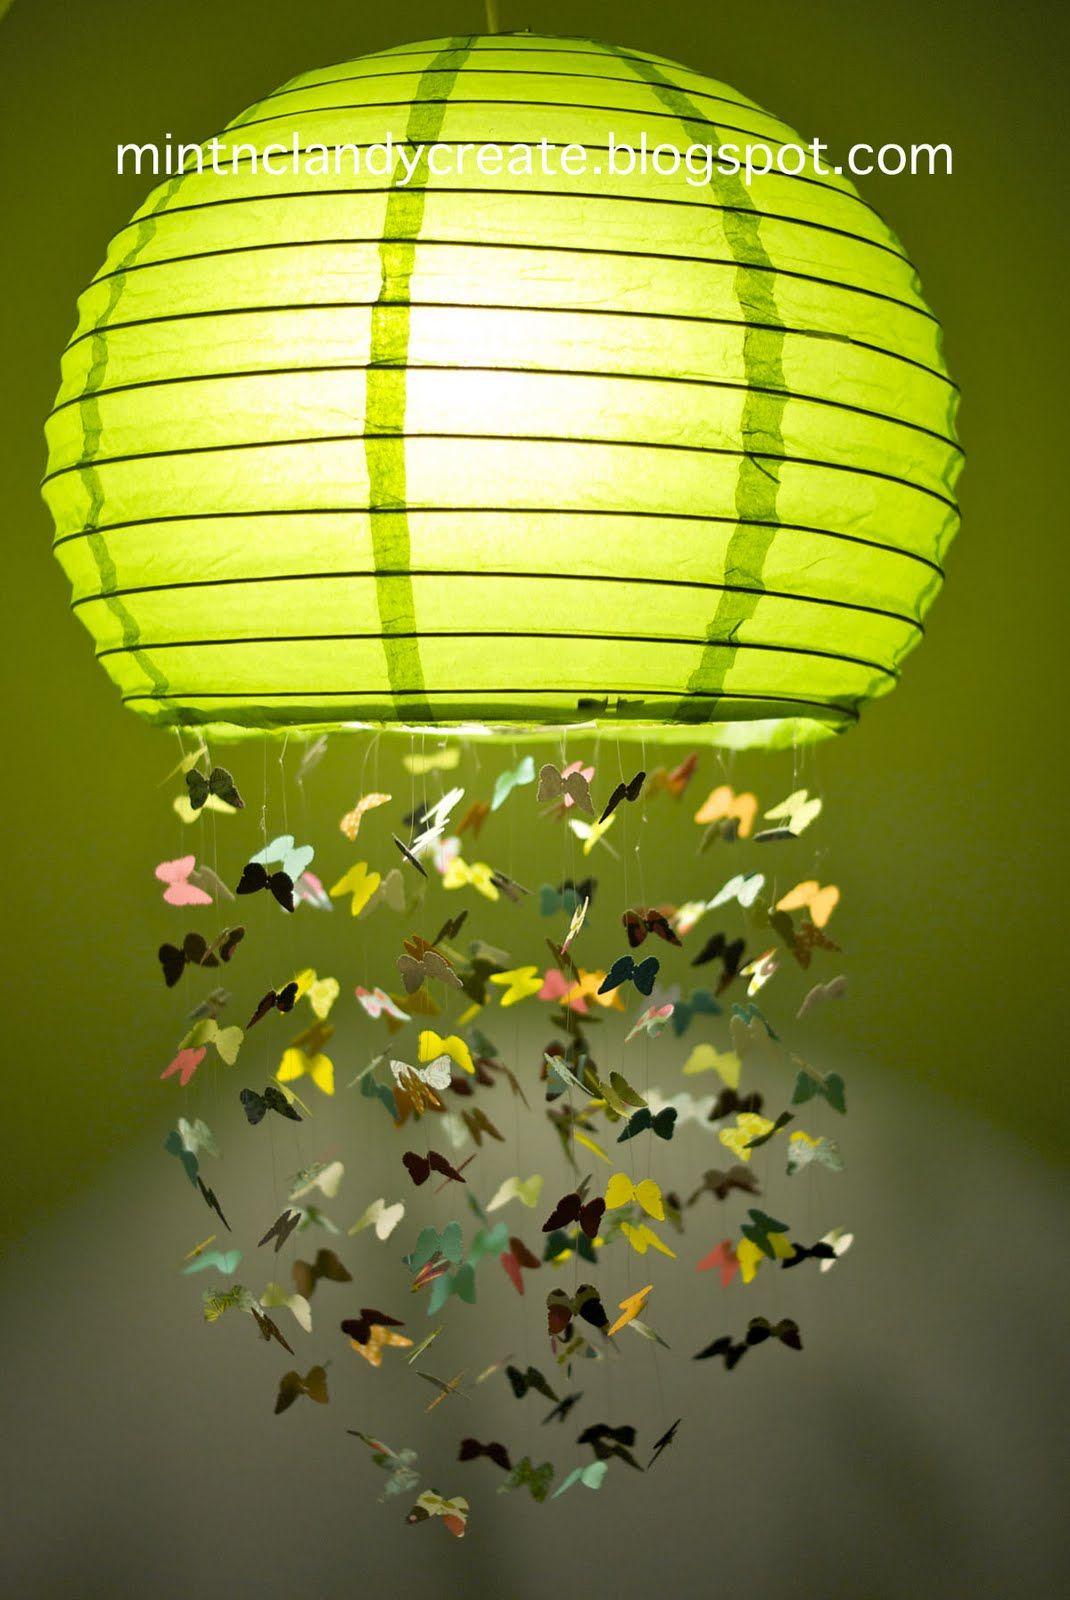 Mint Clandy Create Butterfly Lamp Fly Away With Me Mobile Part 3 Butterfly Lamp Diy Butterfly Paper Lanterns